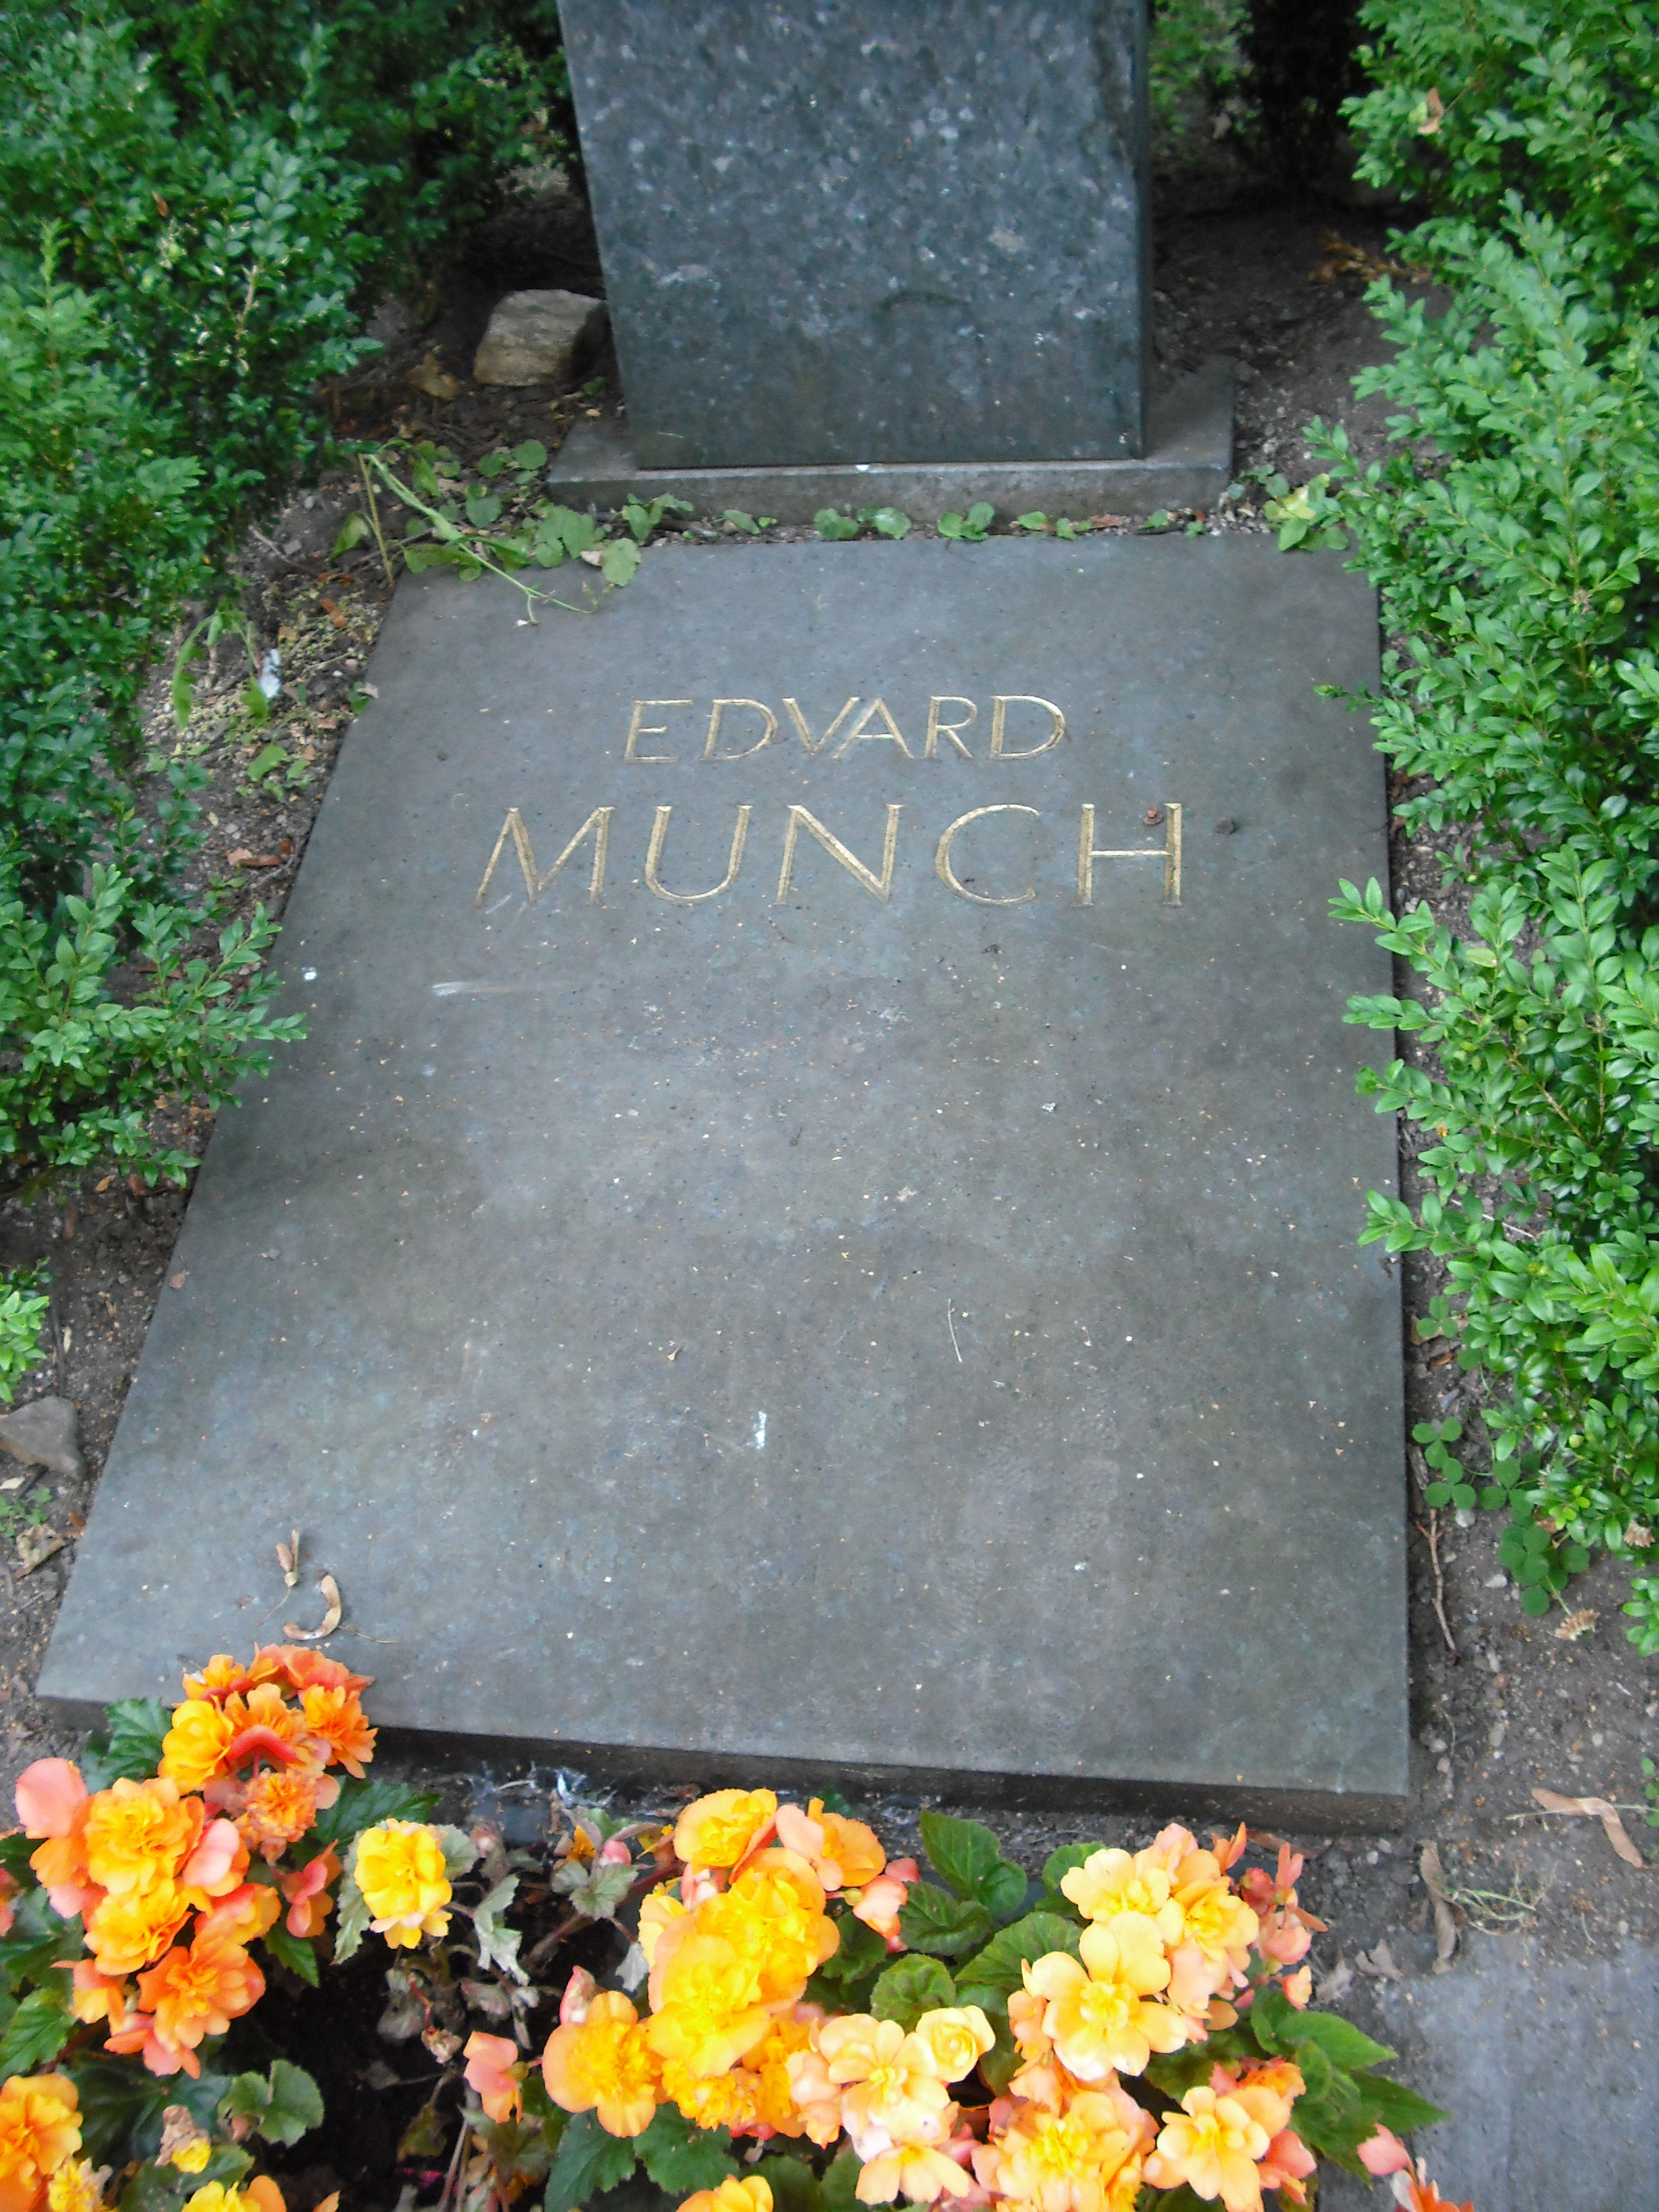 https://upload.wikimedia.org/wikipedia/commons/6/6c/Munch_grave_2.JPG